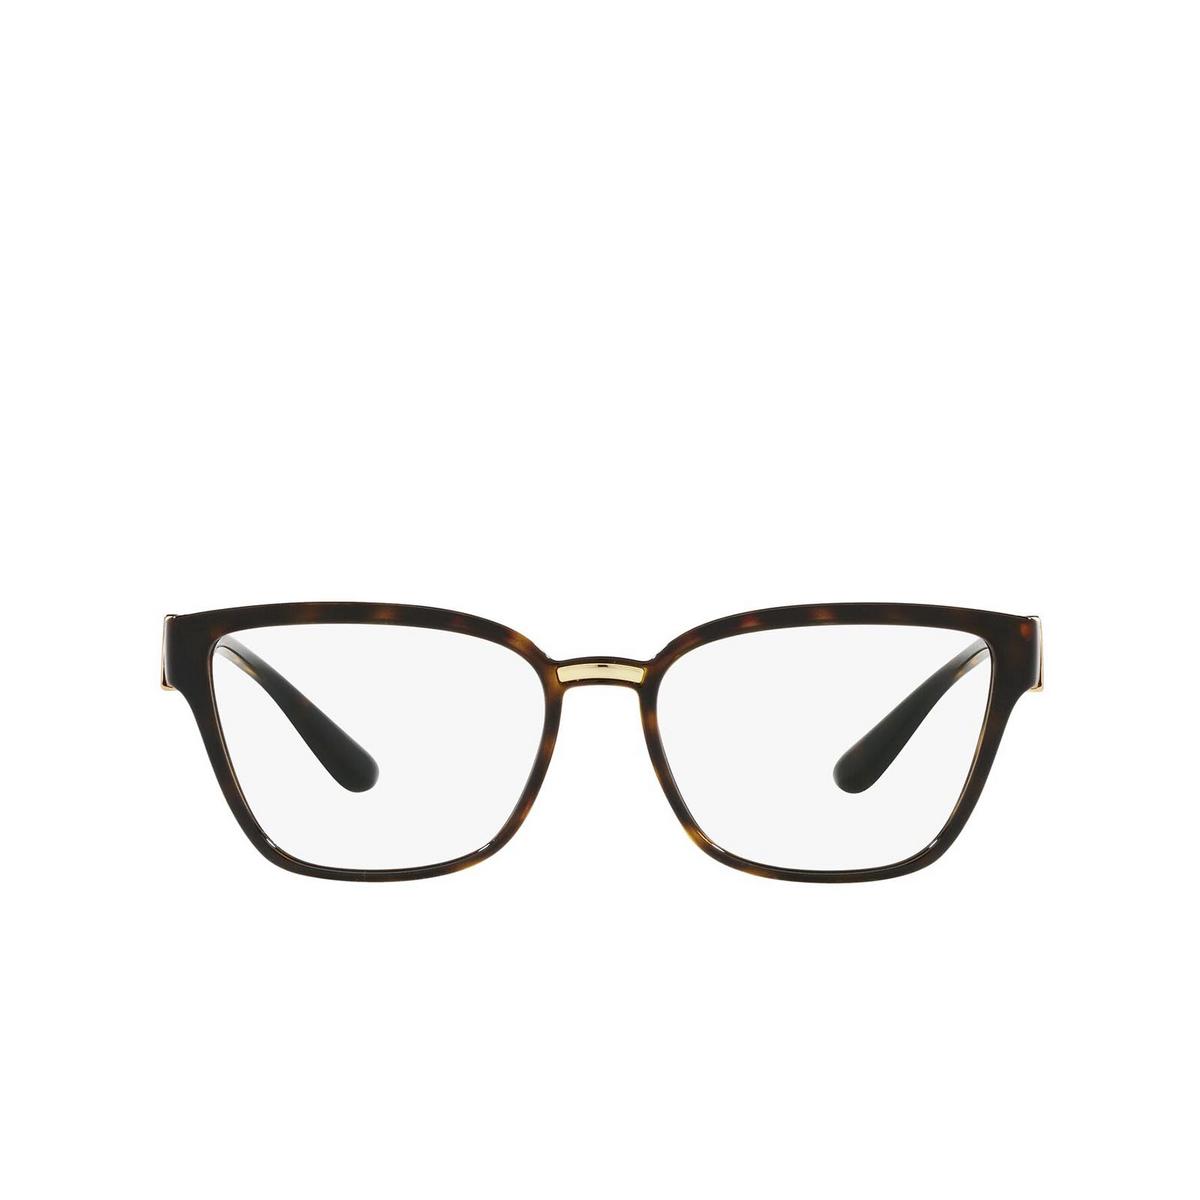 Dolce & Gabbana® Cat-eye Eyeglasses: DG5070 color Havana 502 - front view.